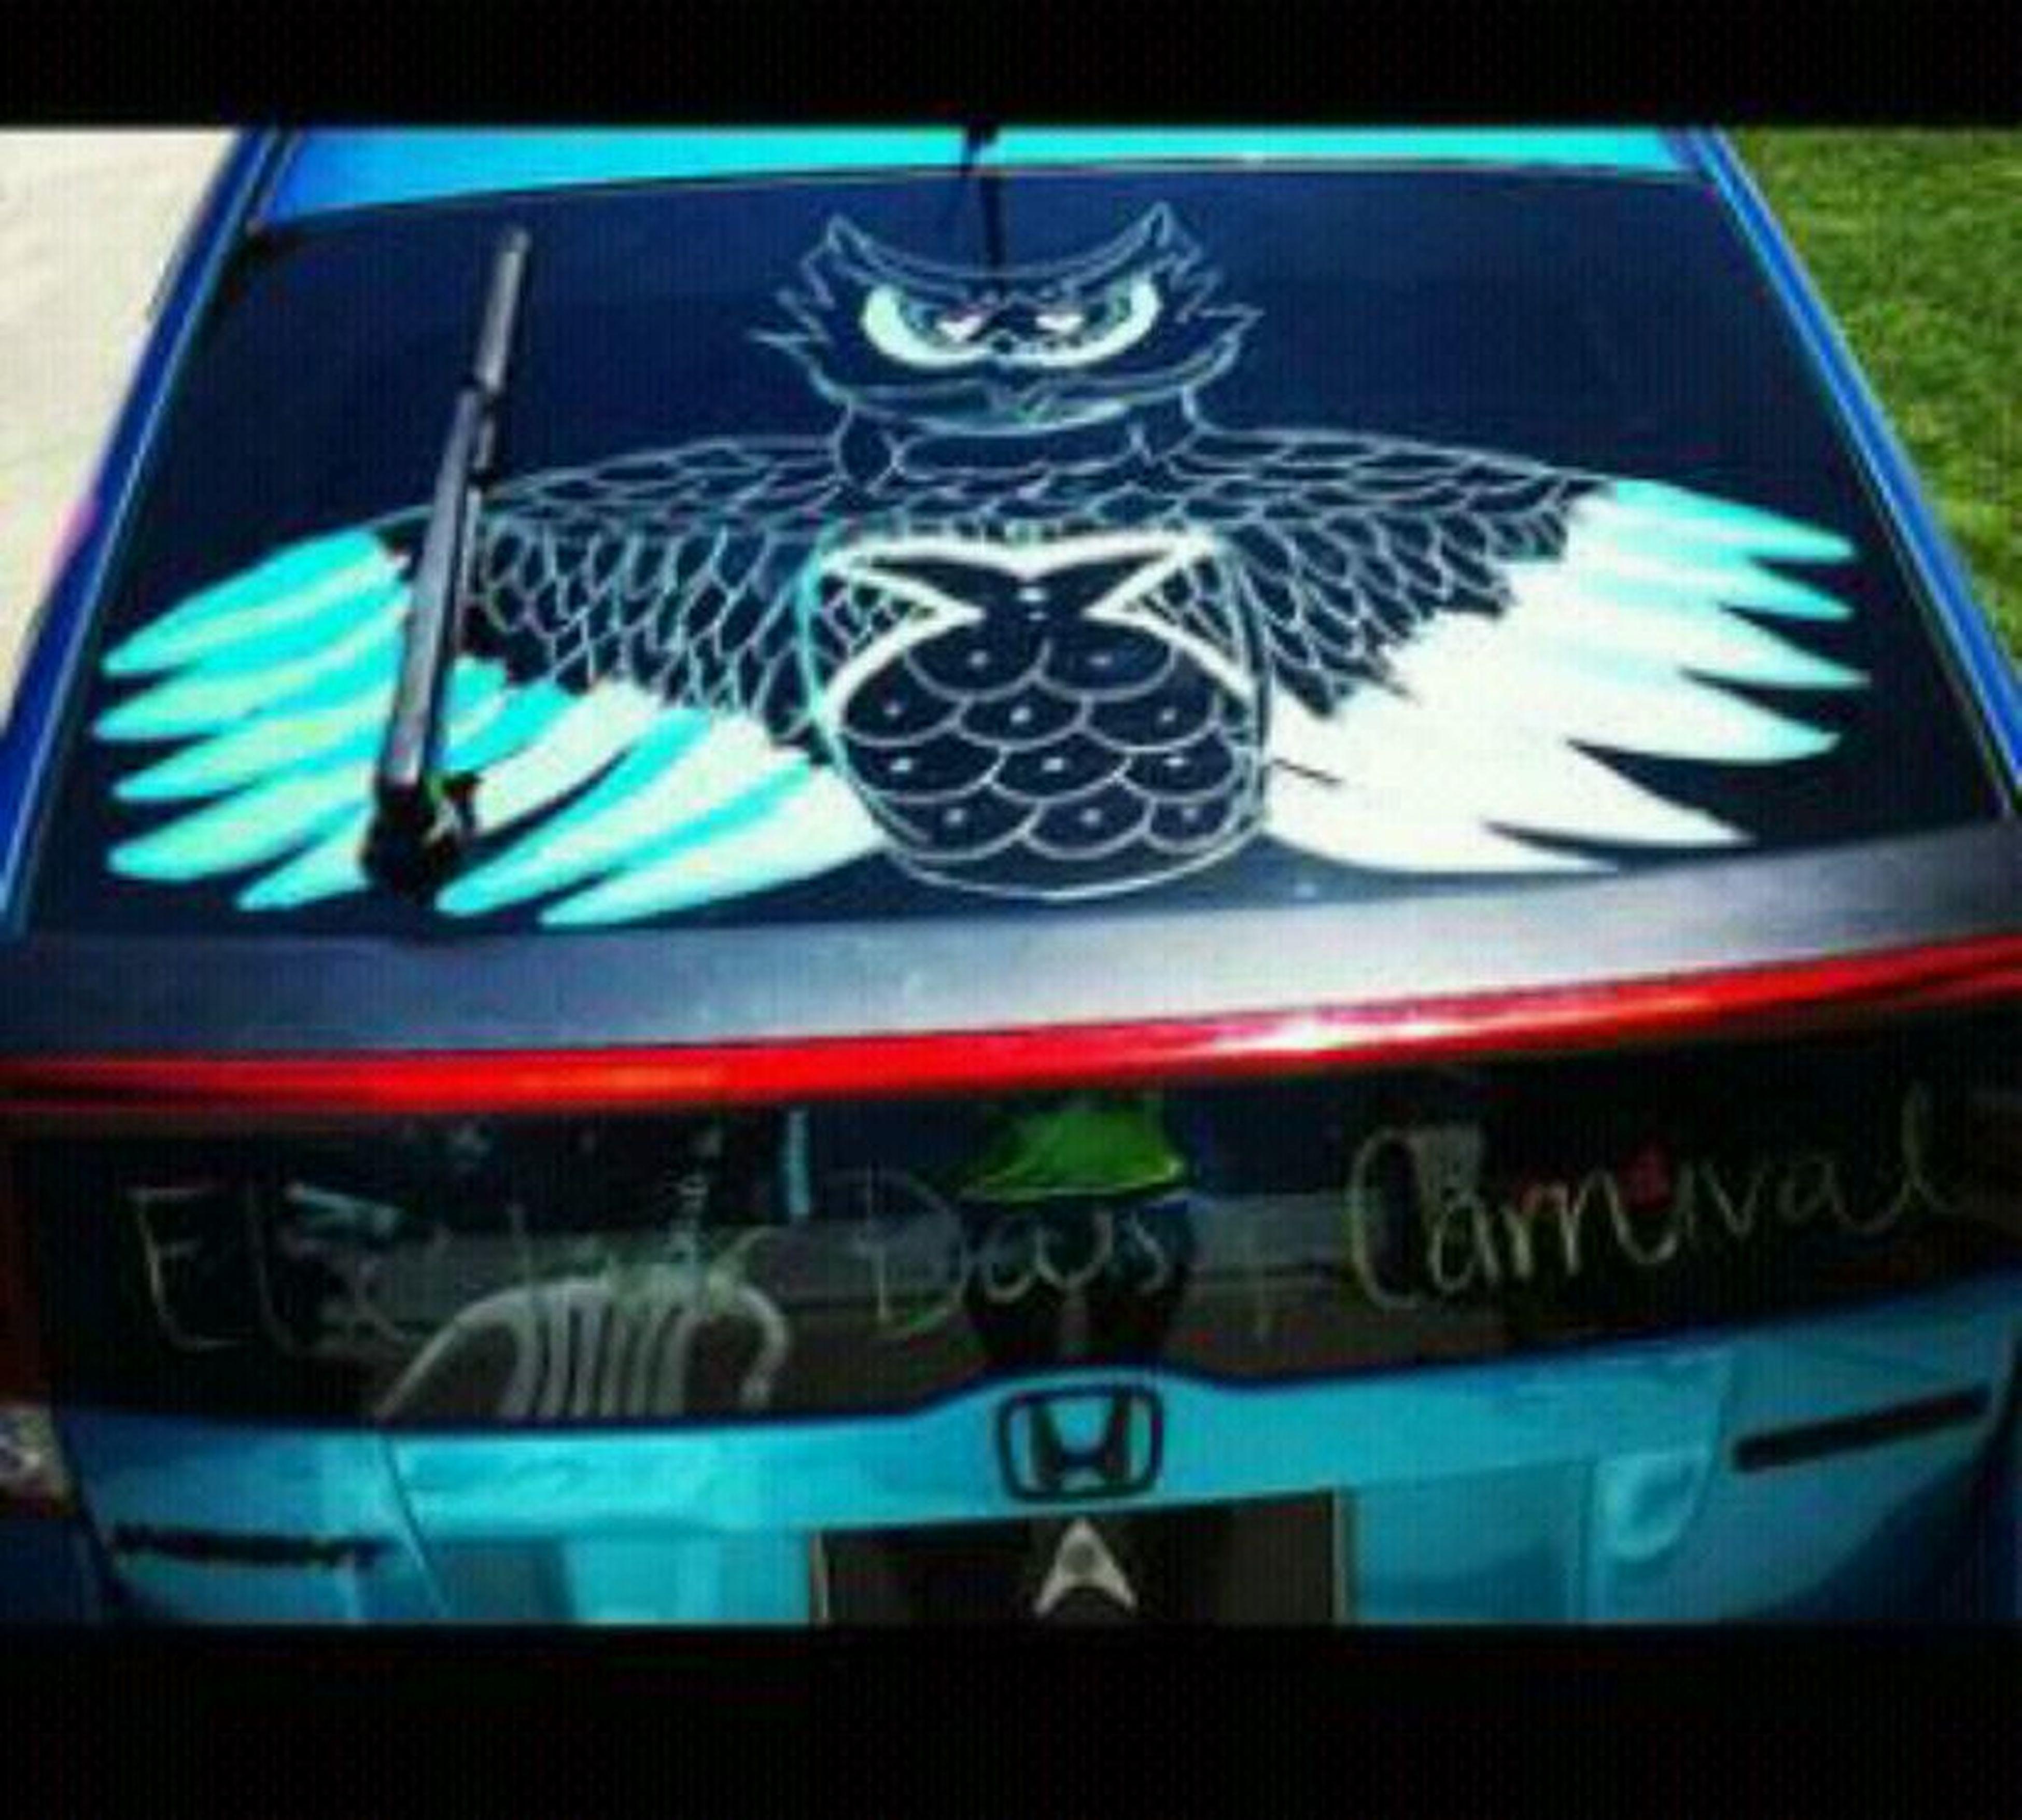 When I drew the Insomniac Owl on the back of my car . ♡ EDC InsomniacOwl Edm Rave Las vegas . ♡